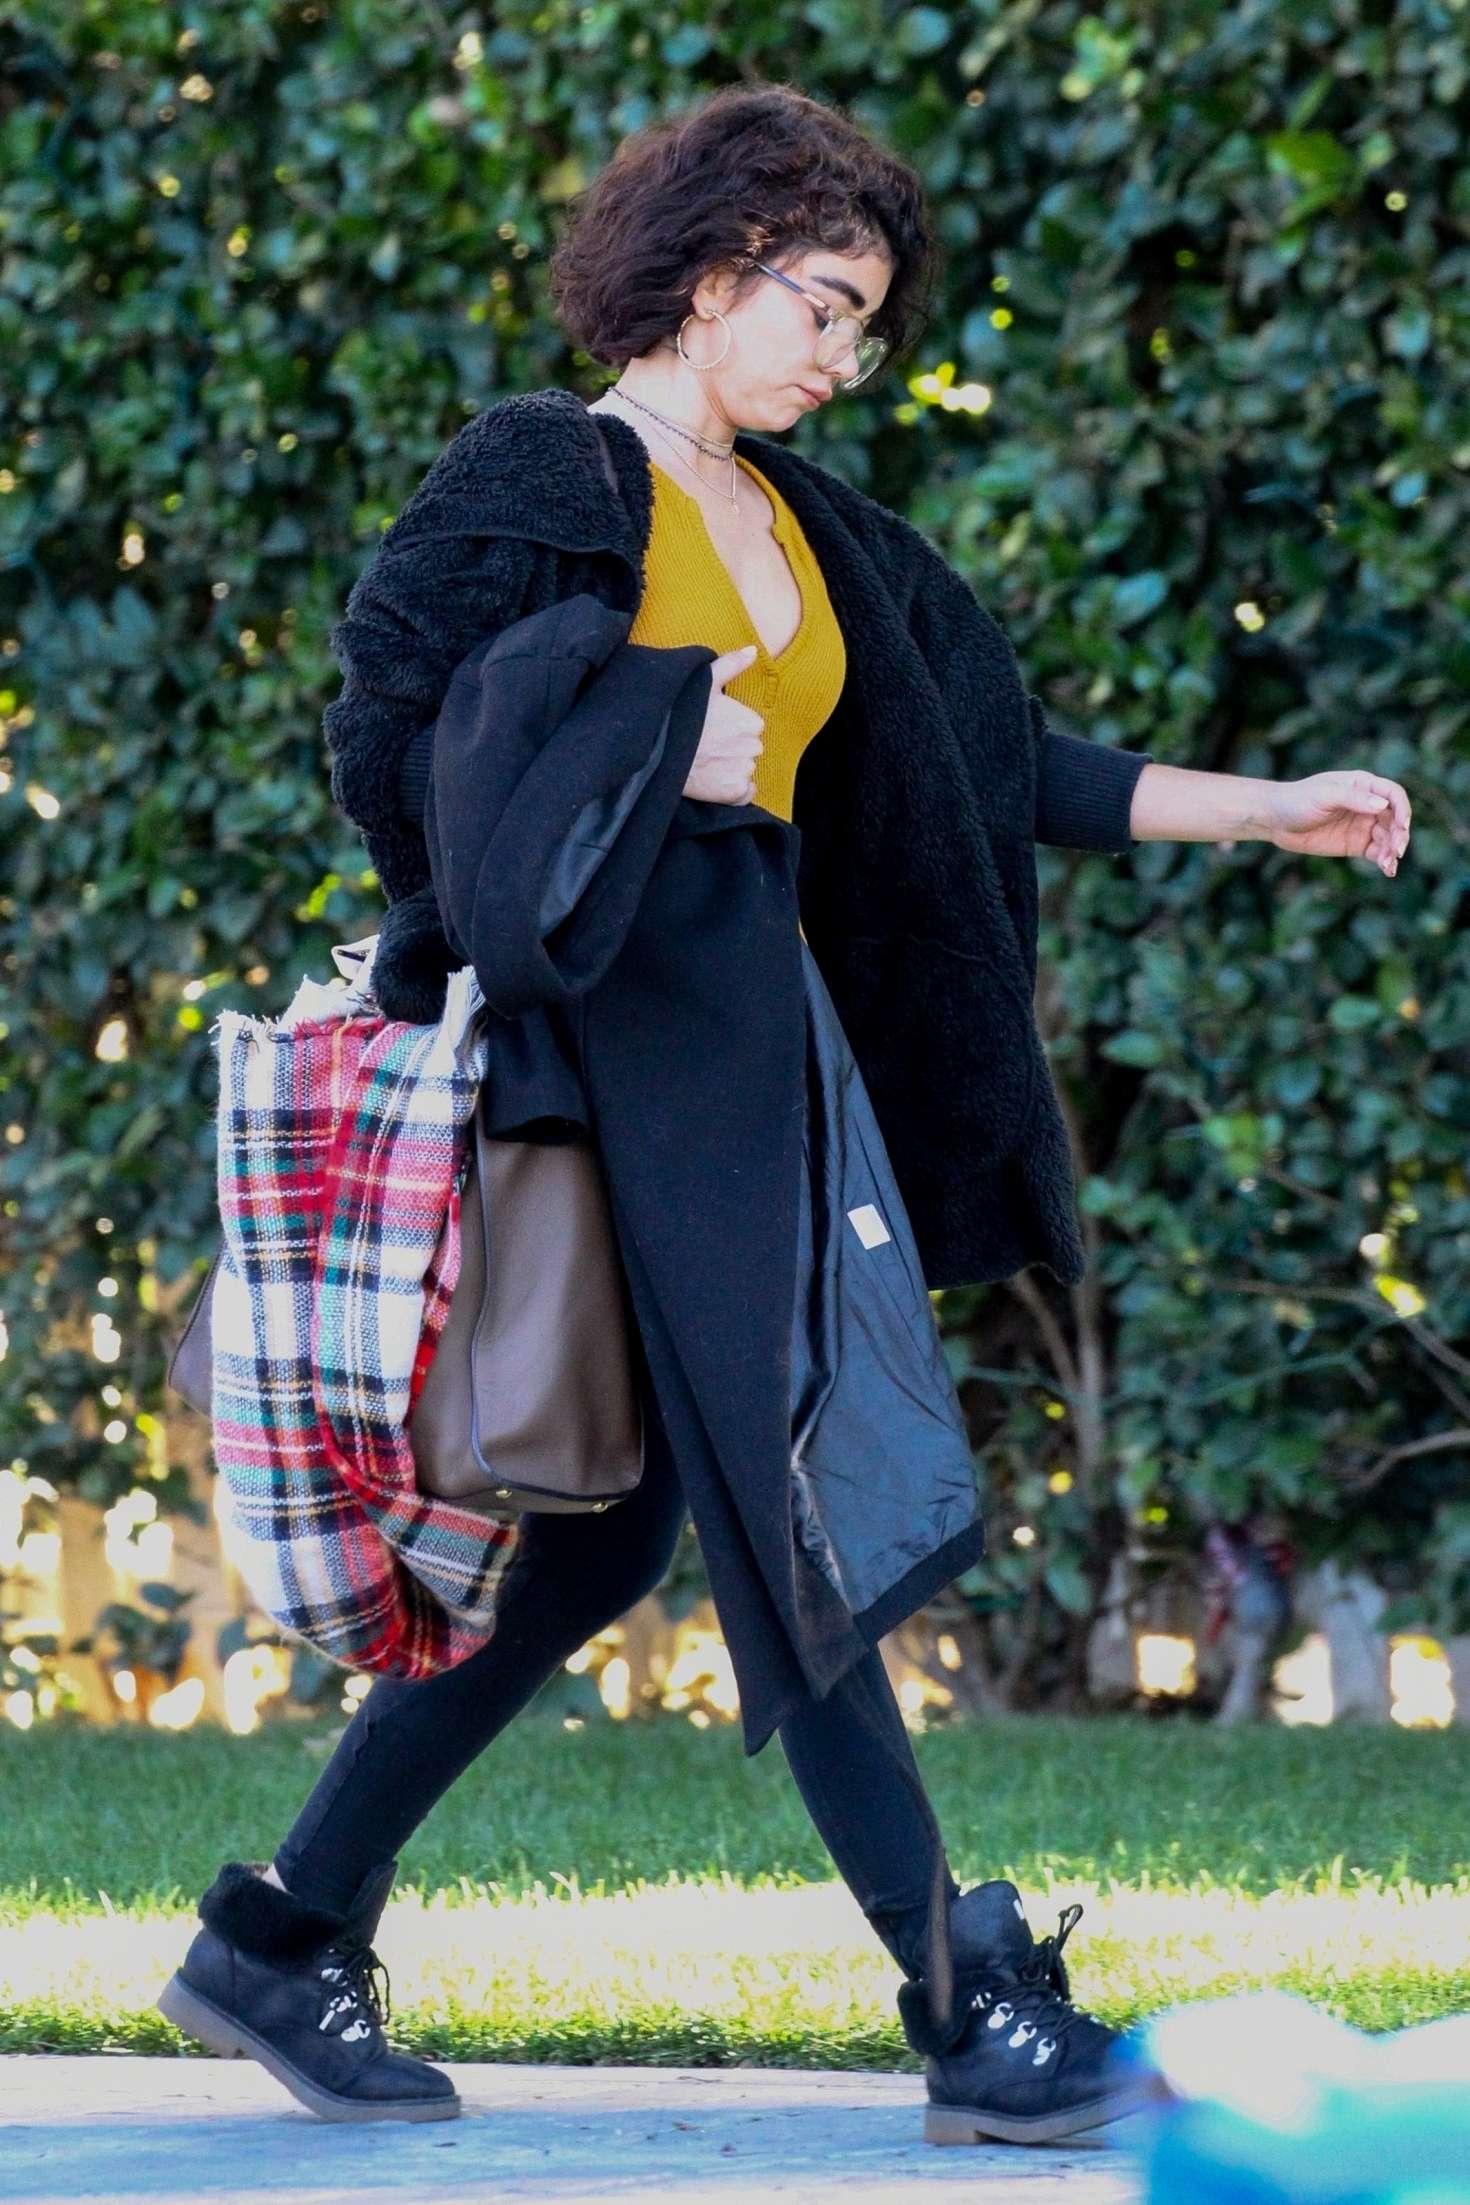 Sarah Hyland 2018 : Sarah Hyland: Out in Studio City -04